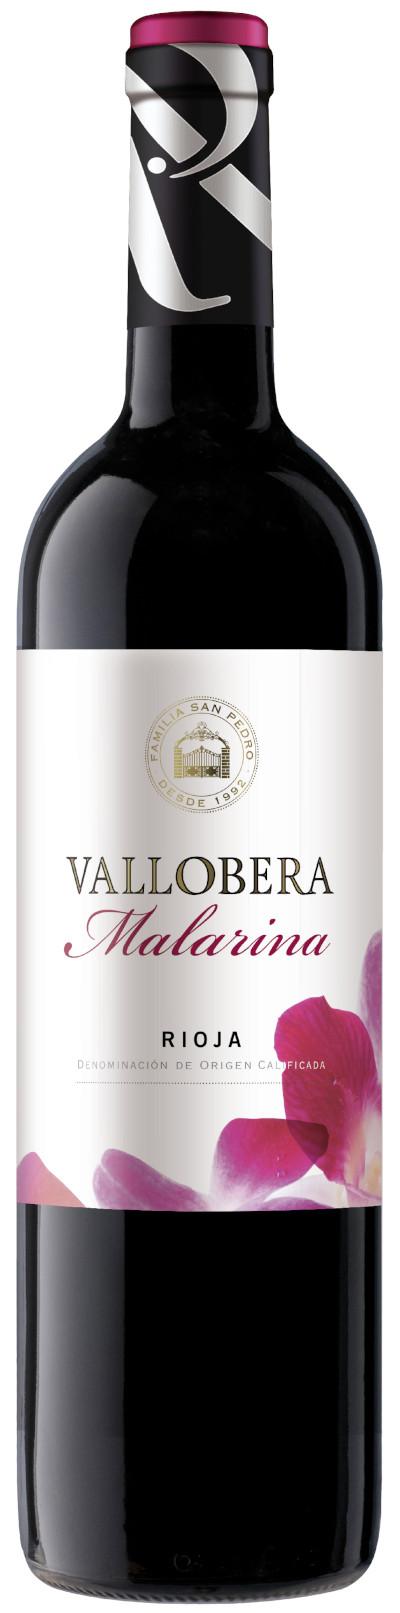 Vallobera - Malarina Rioja DOCa